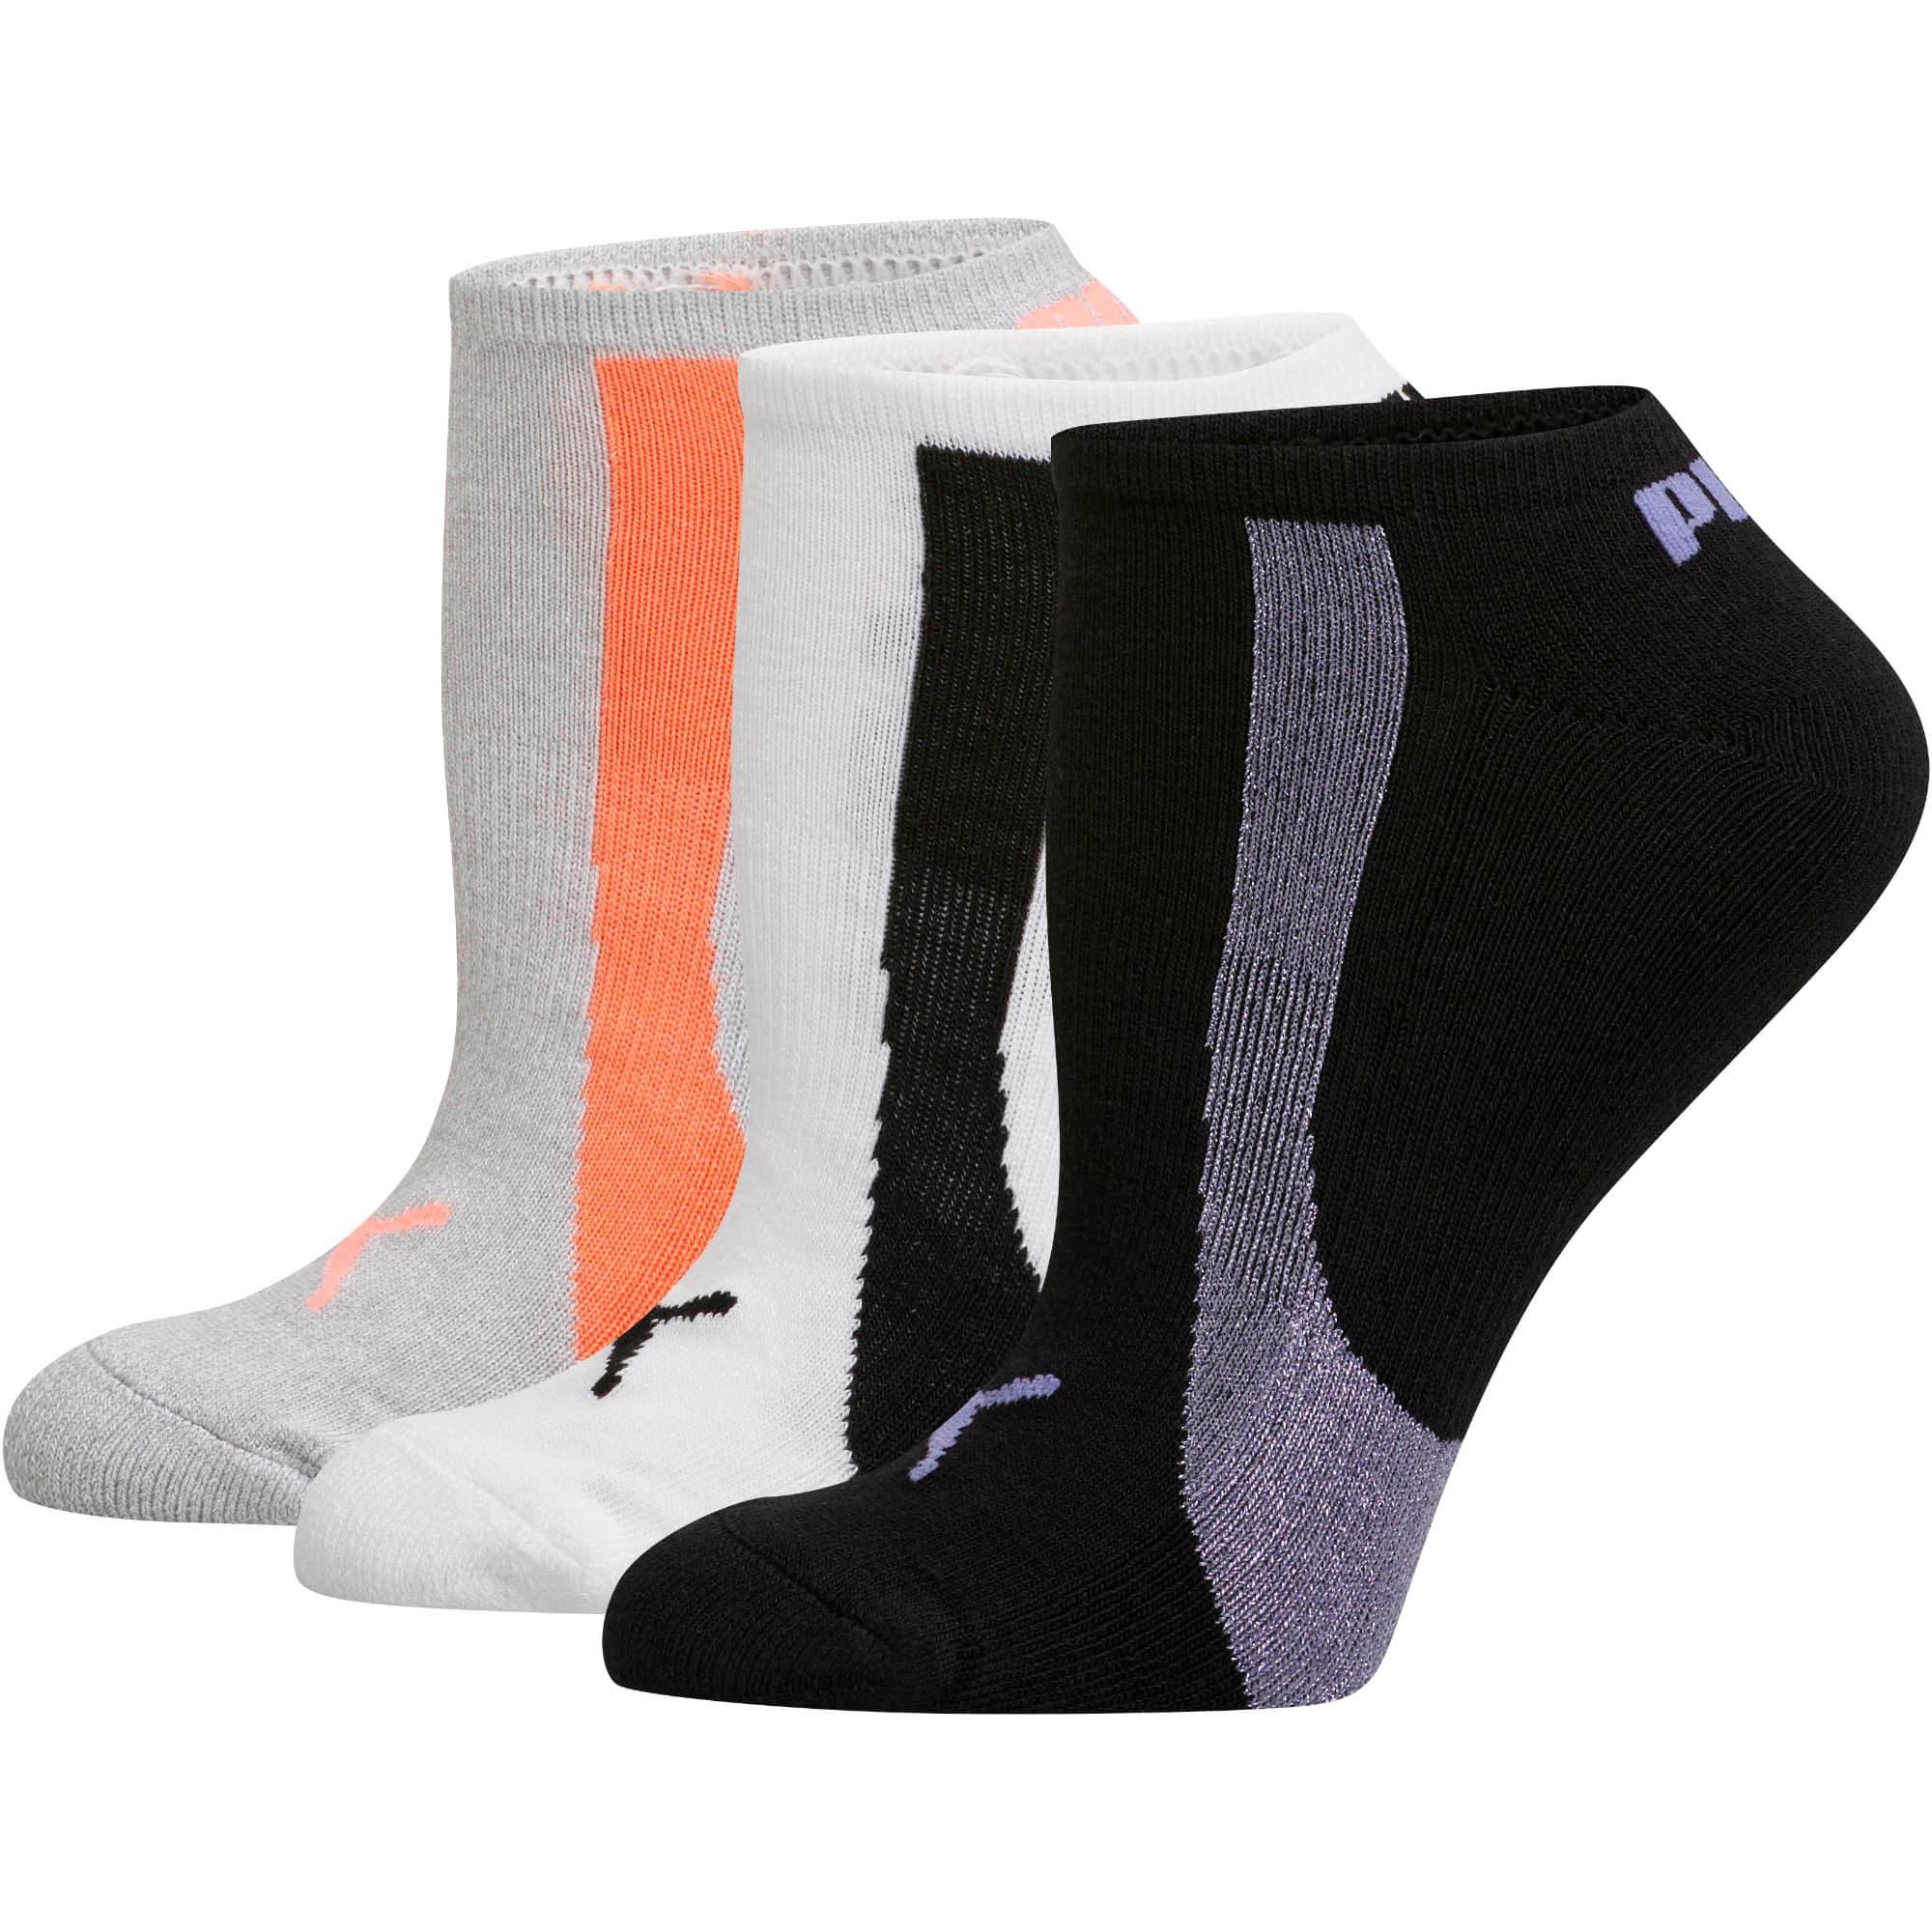 Thumbnail 1 of Women's No Show Socks [3 Pack], LT PASTEL PURPLE, medium